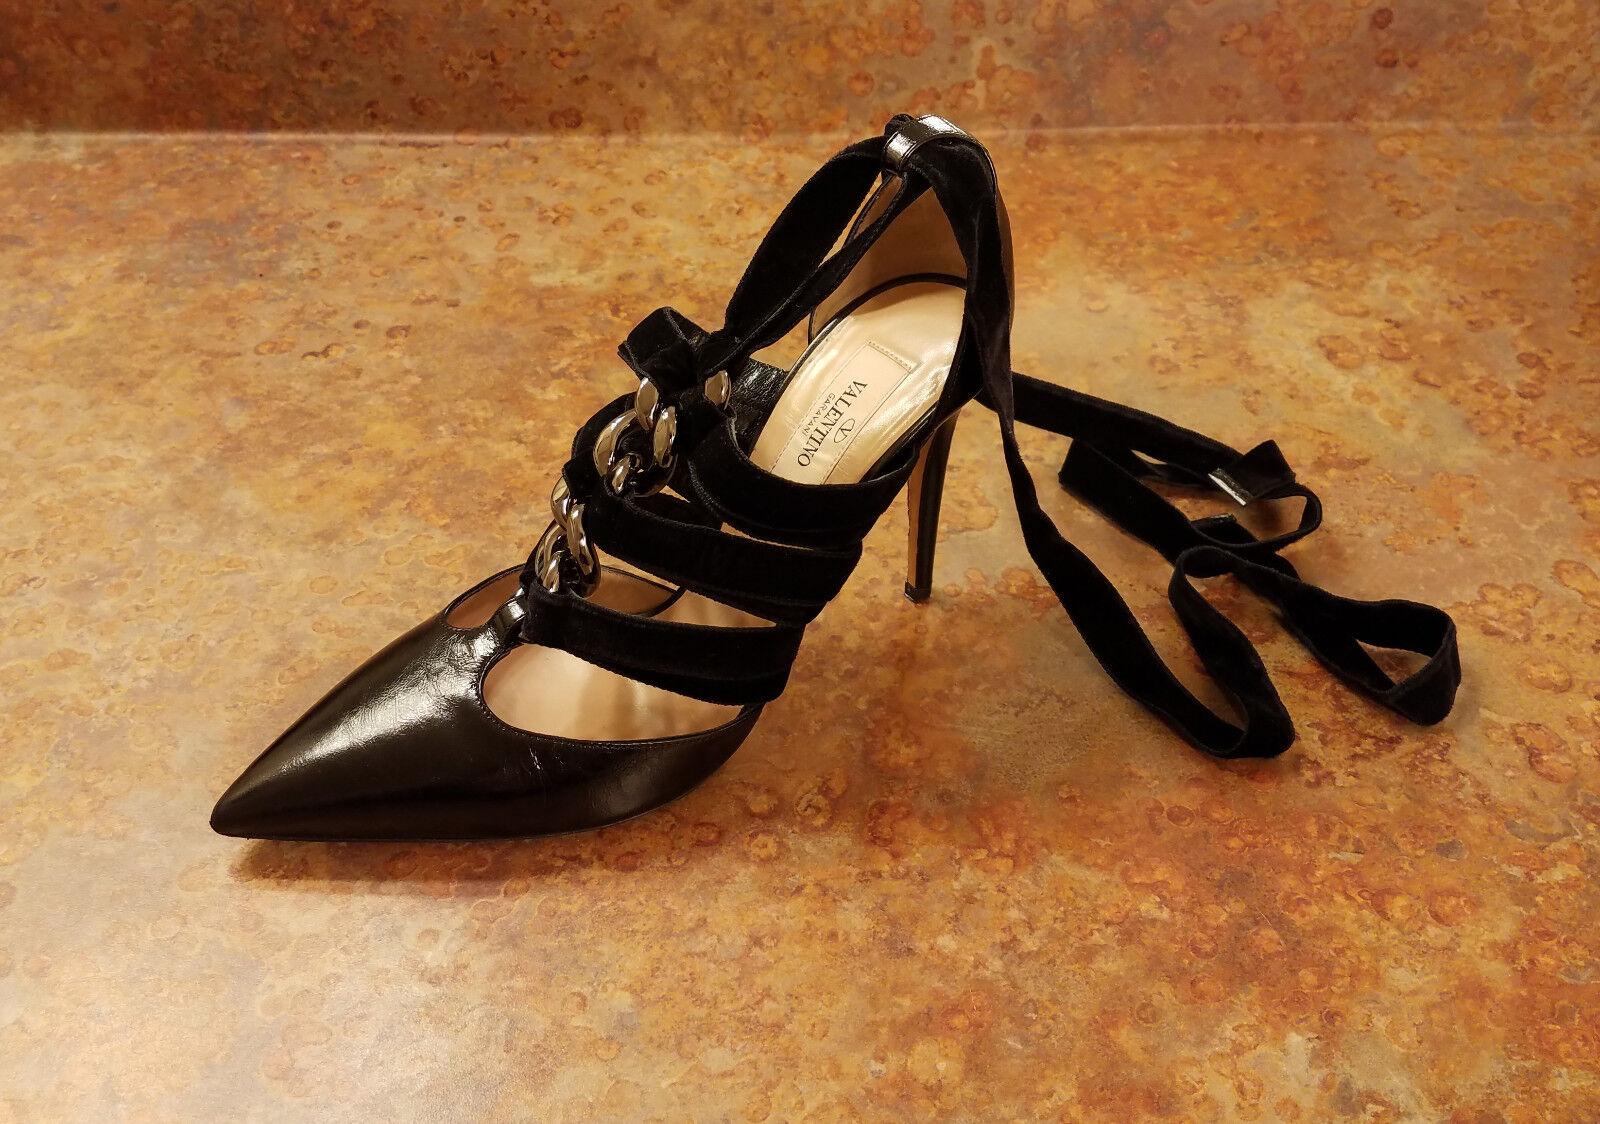 New  Valentino Chain Velvet Ankle-Wrap Pump Black Size 7.5 US 37.5 Eur MSRP  995